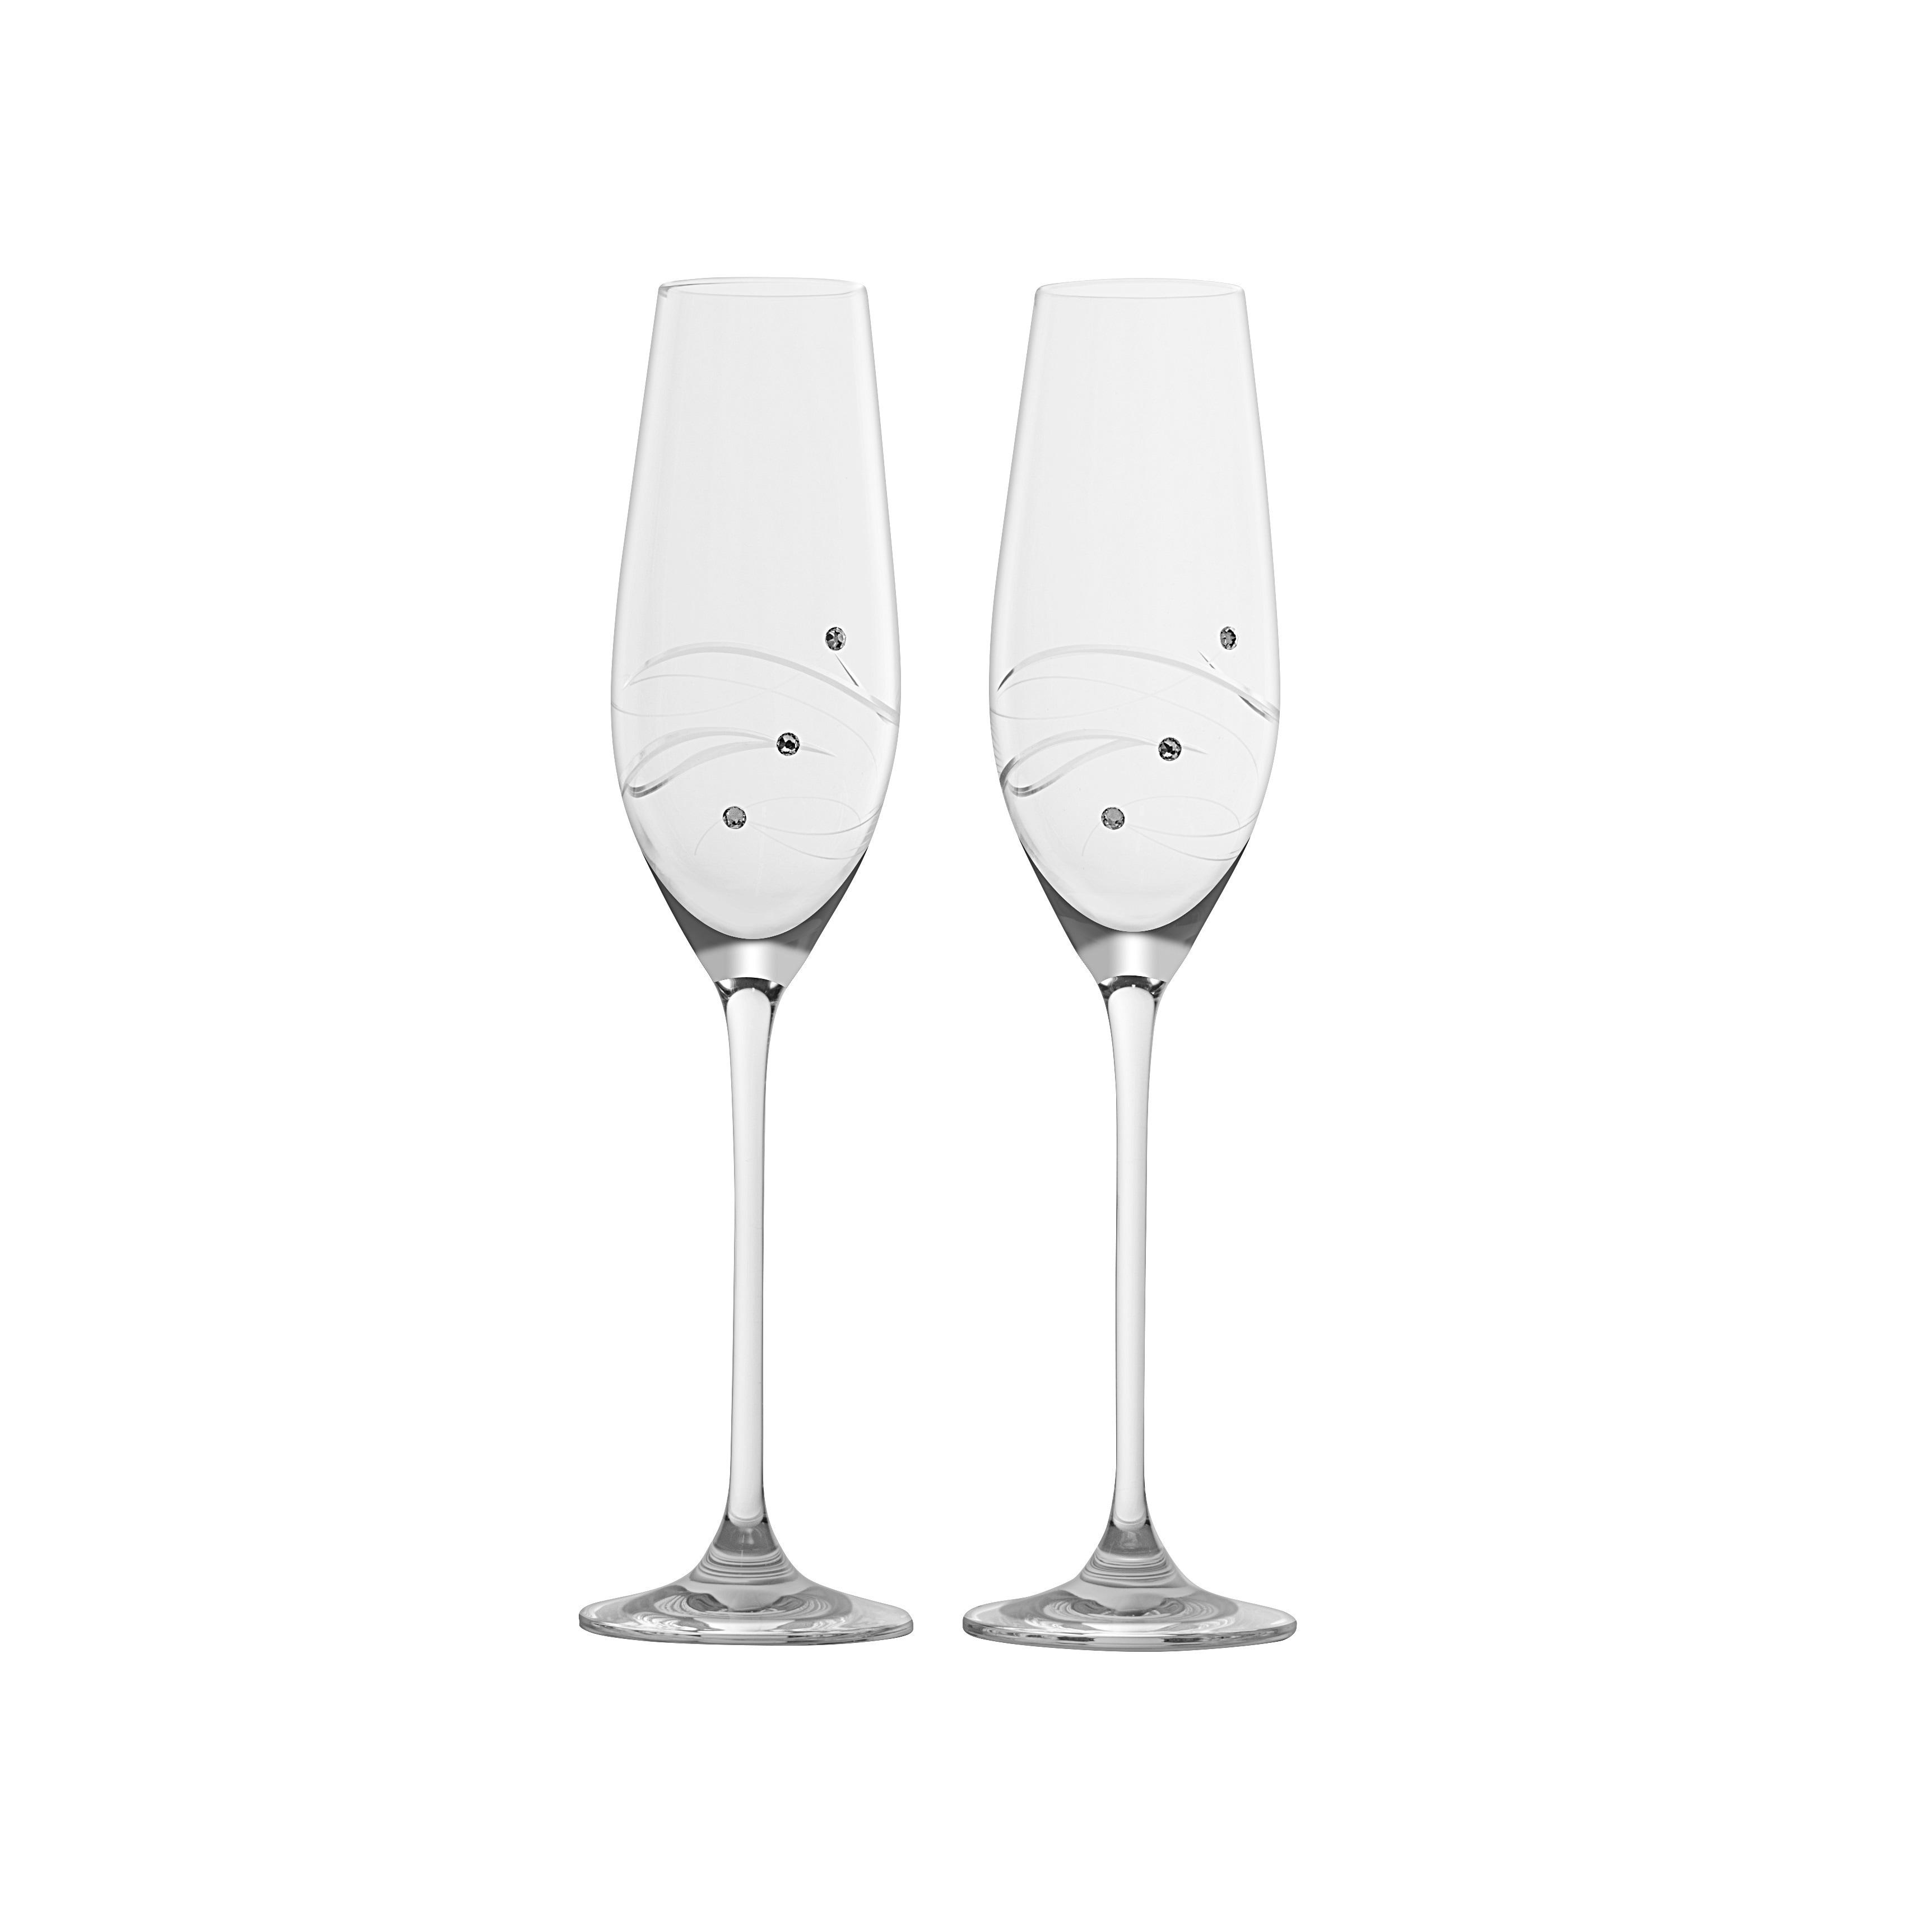 Barski Handmade Glass Toasting Flutes (Set of 2 Flutes), ...